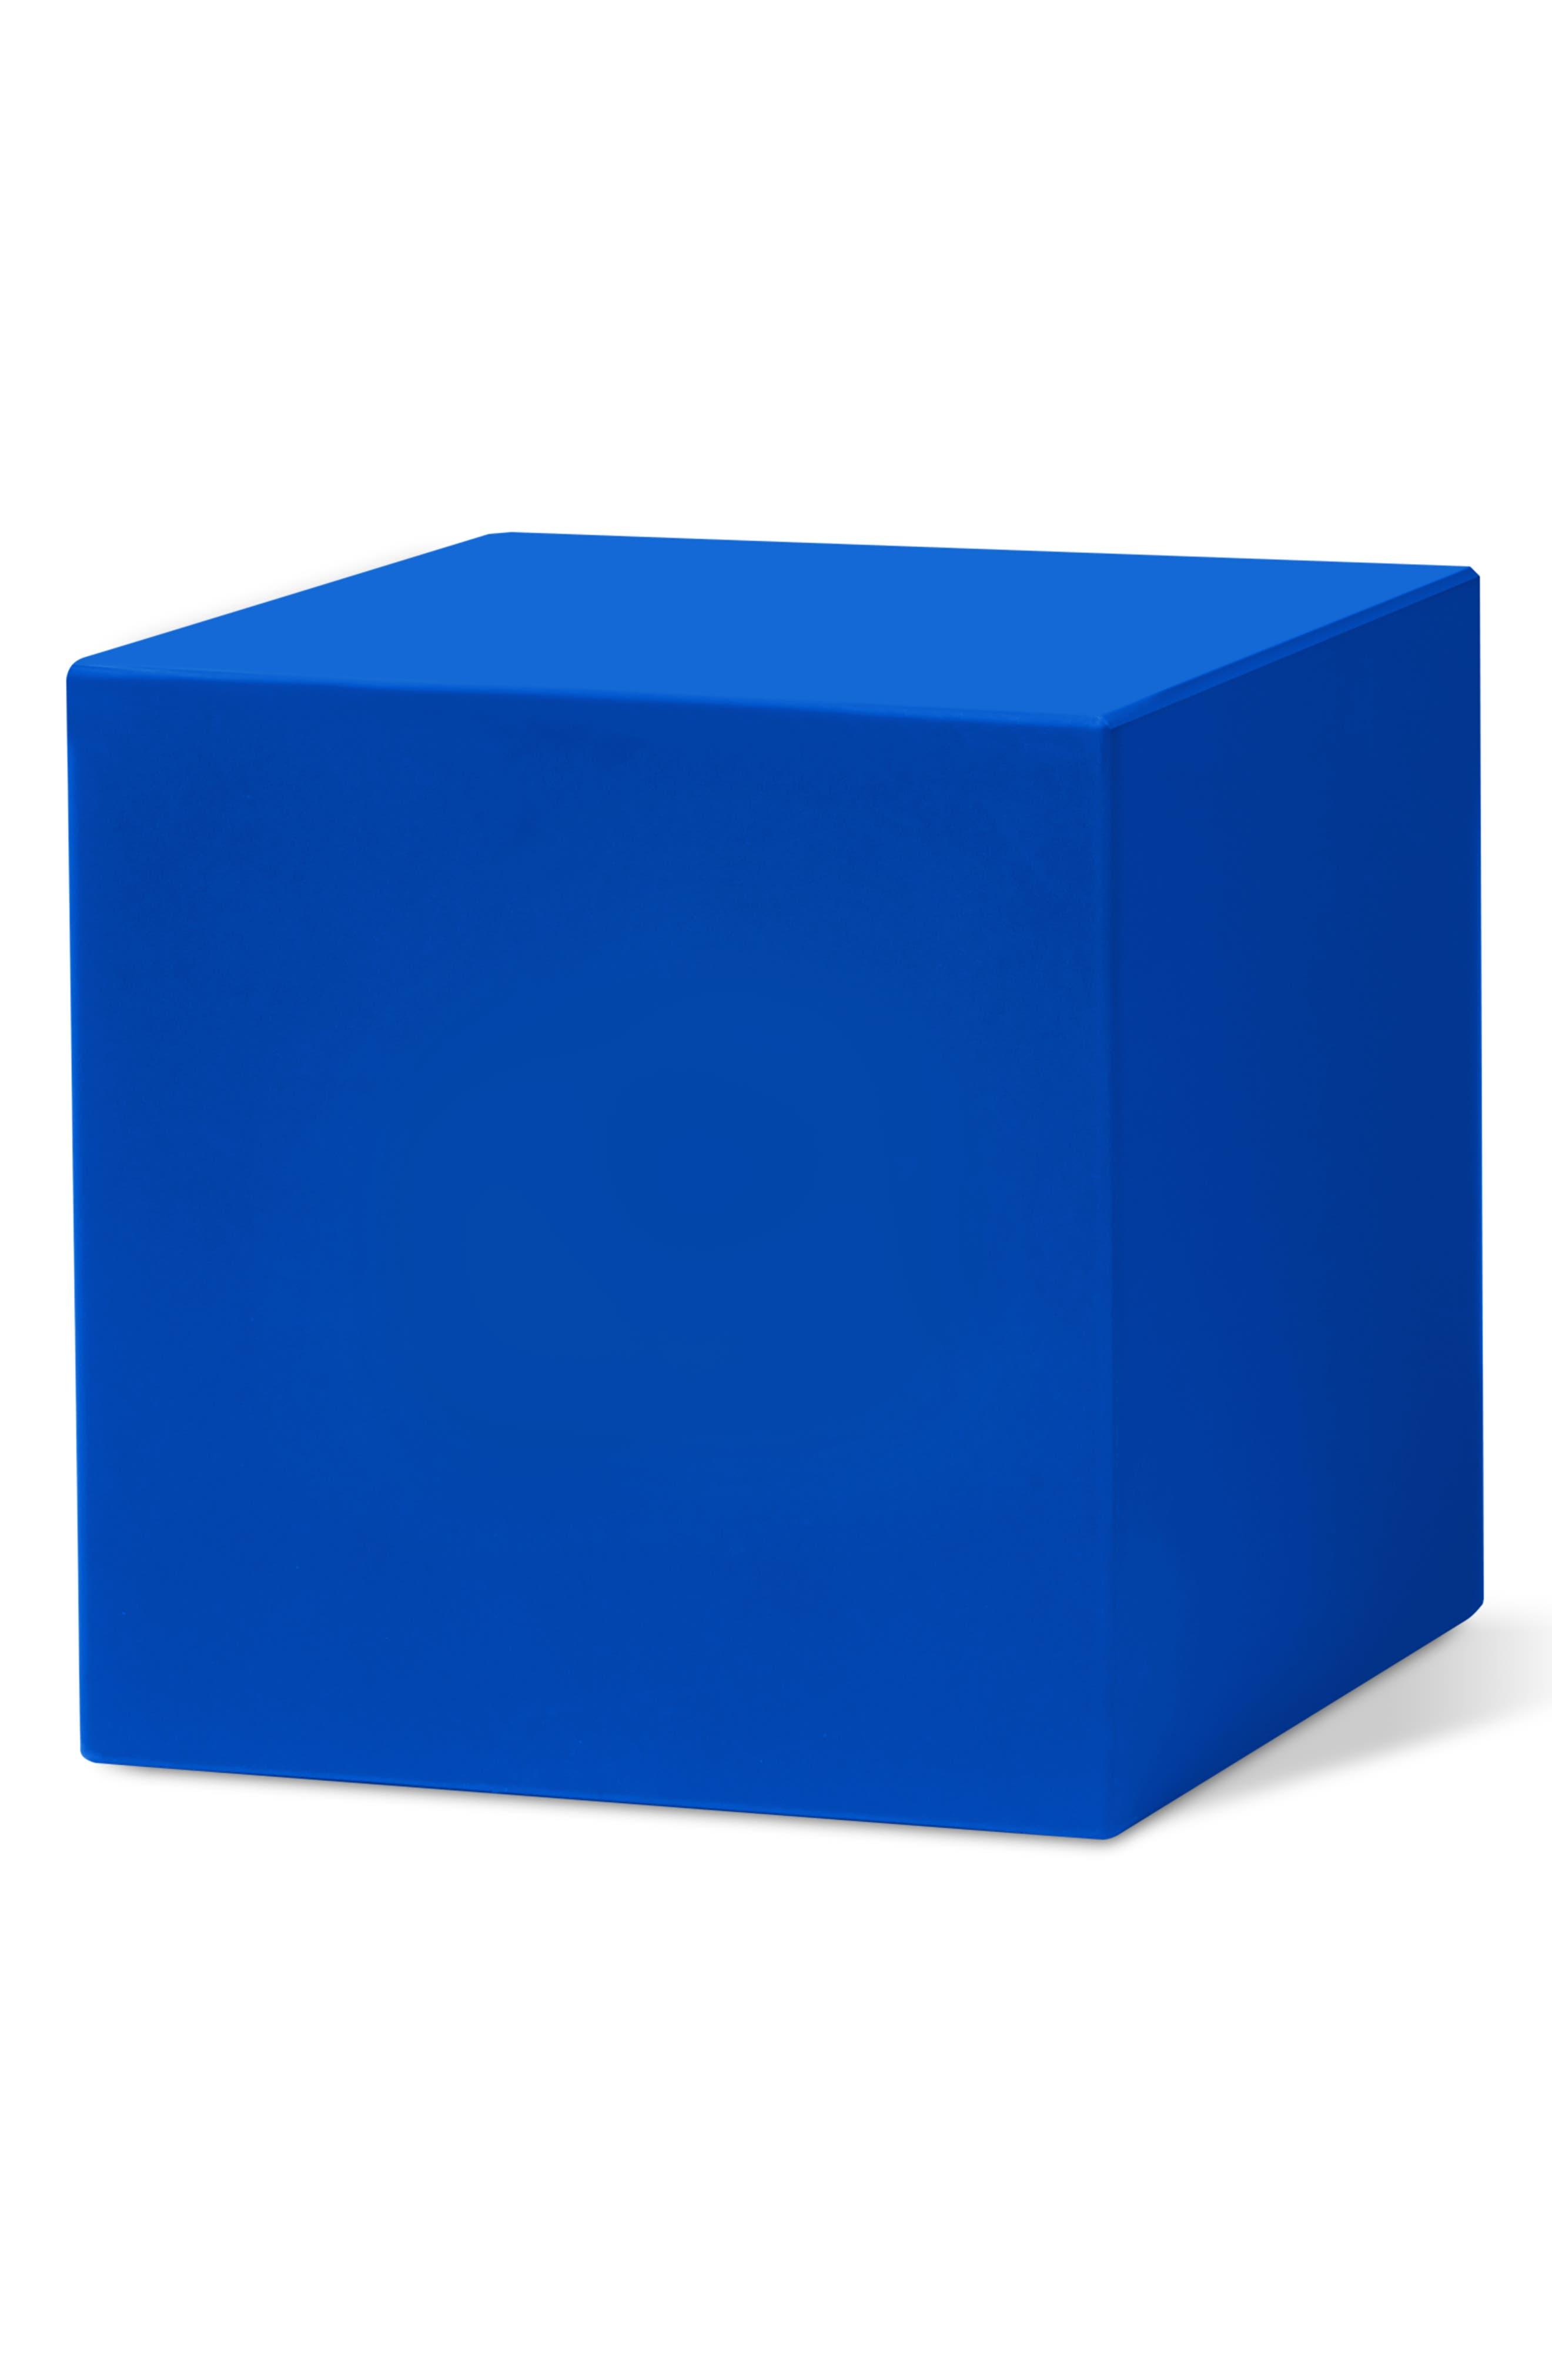 Color Cube Clock,                             Alternate thumbnail 6, color,                             001